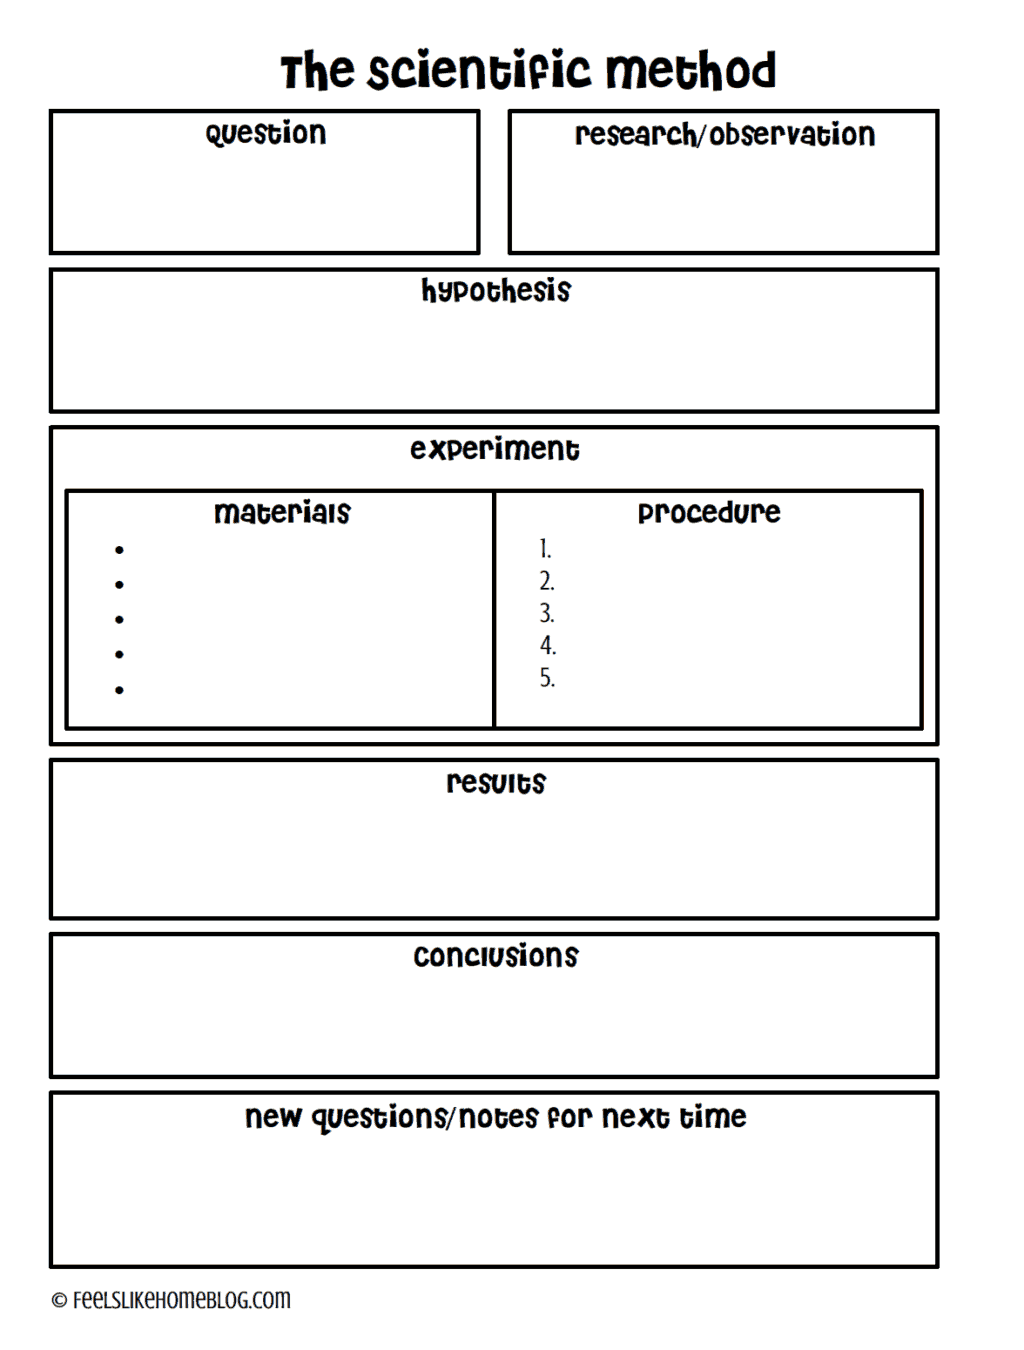 Teaching The Scientific Method A Free Printable Https Feelslikehome Teaching Scientific Method Scientific Method Free Printable Scientific Method Worksheet [ 1350 x 1024 Pixel ]